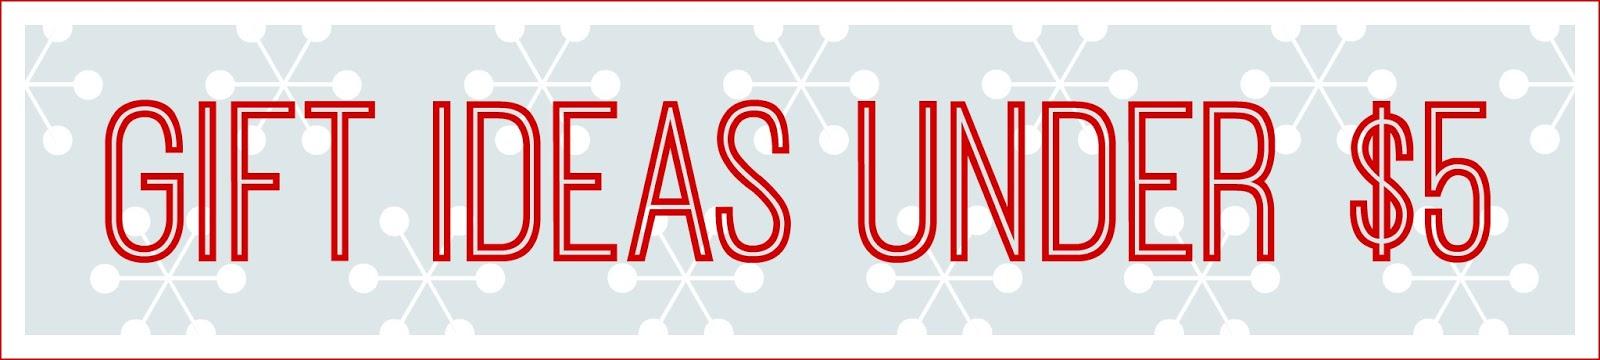 Peachy Keen Blog: Christmas Gift Ideas Under $5